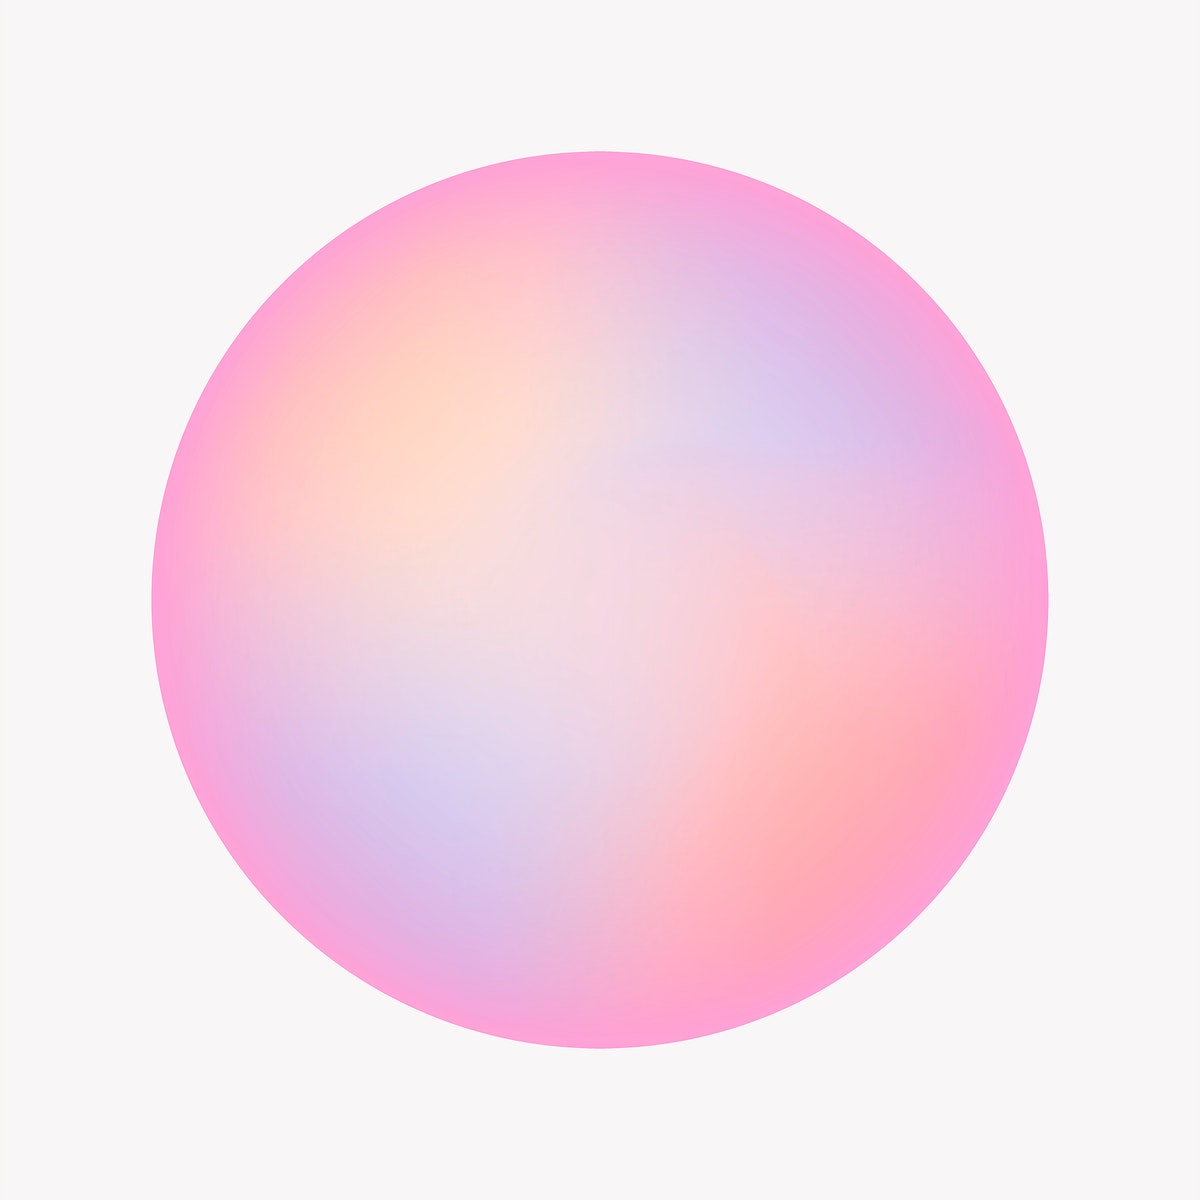 Colorful round gradient element